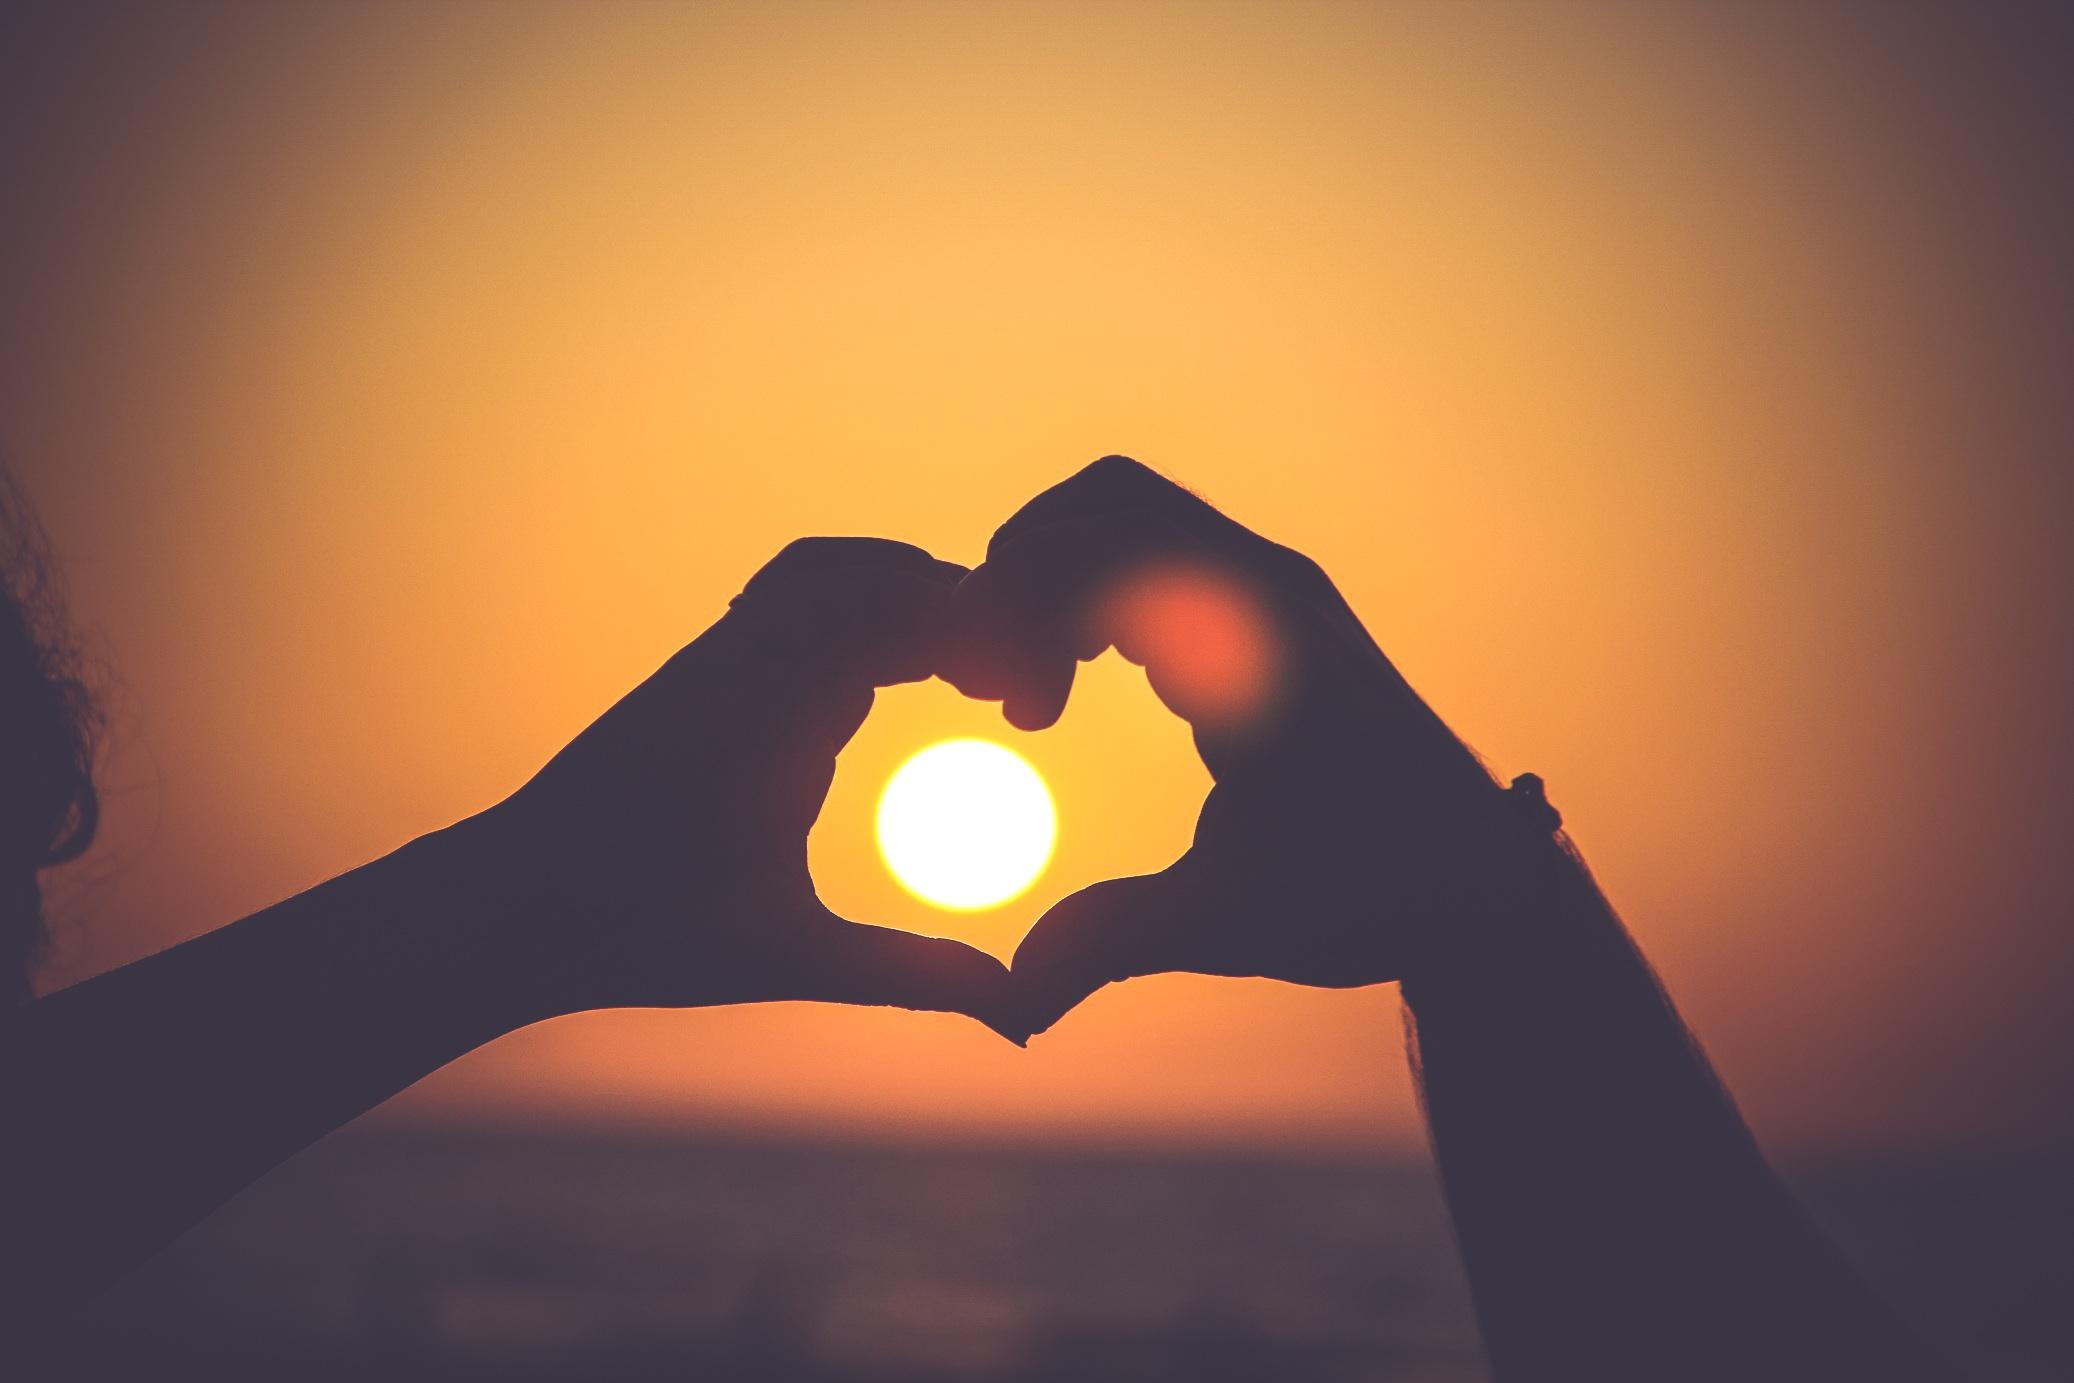 Free Images Hand Silhouette Light Sun Sunrise Sunset